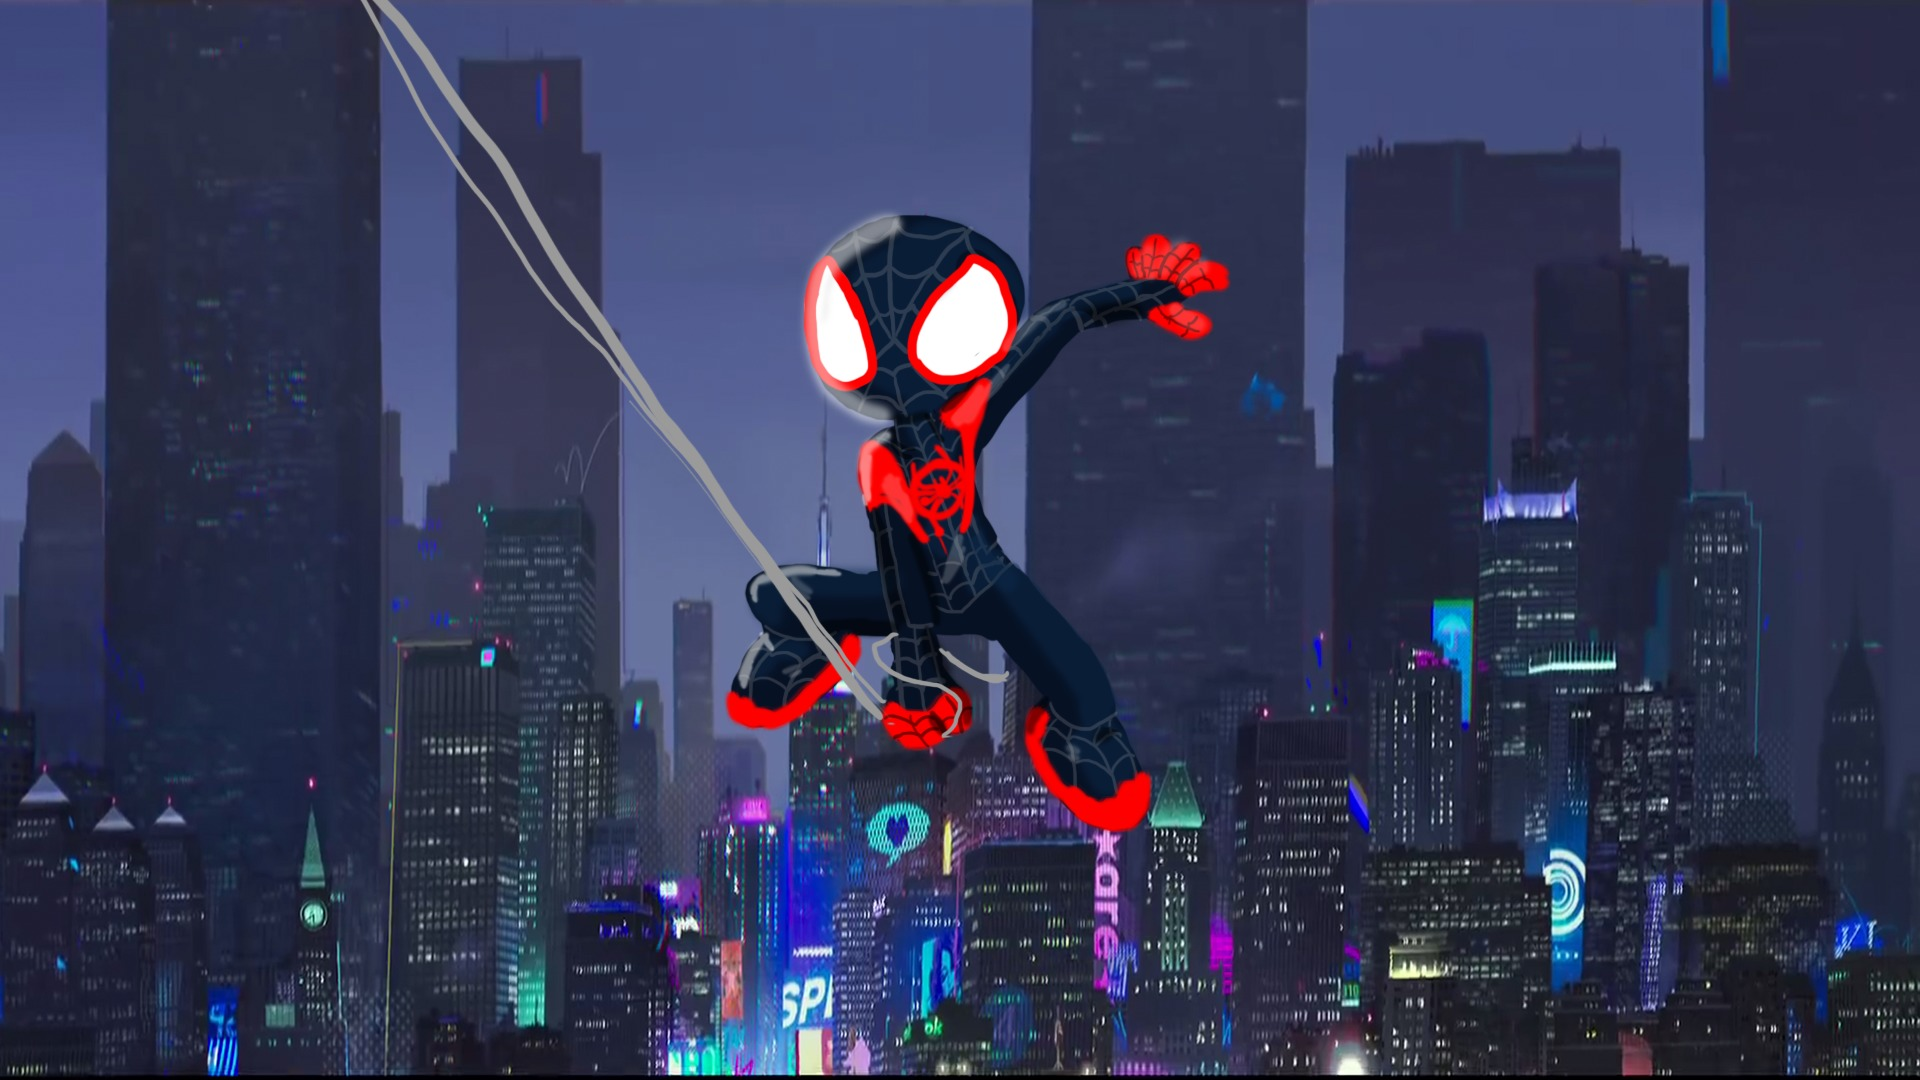 1360x768 Spiderman Into The Spider Verse Artwork Desktop Laptop Hd